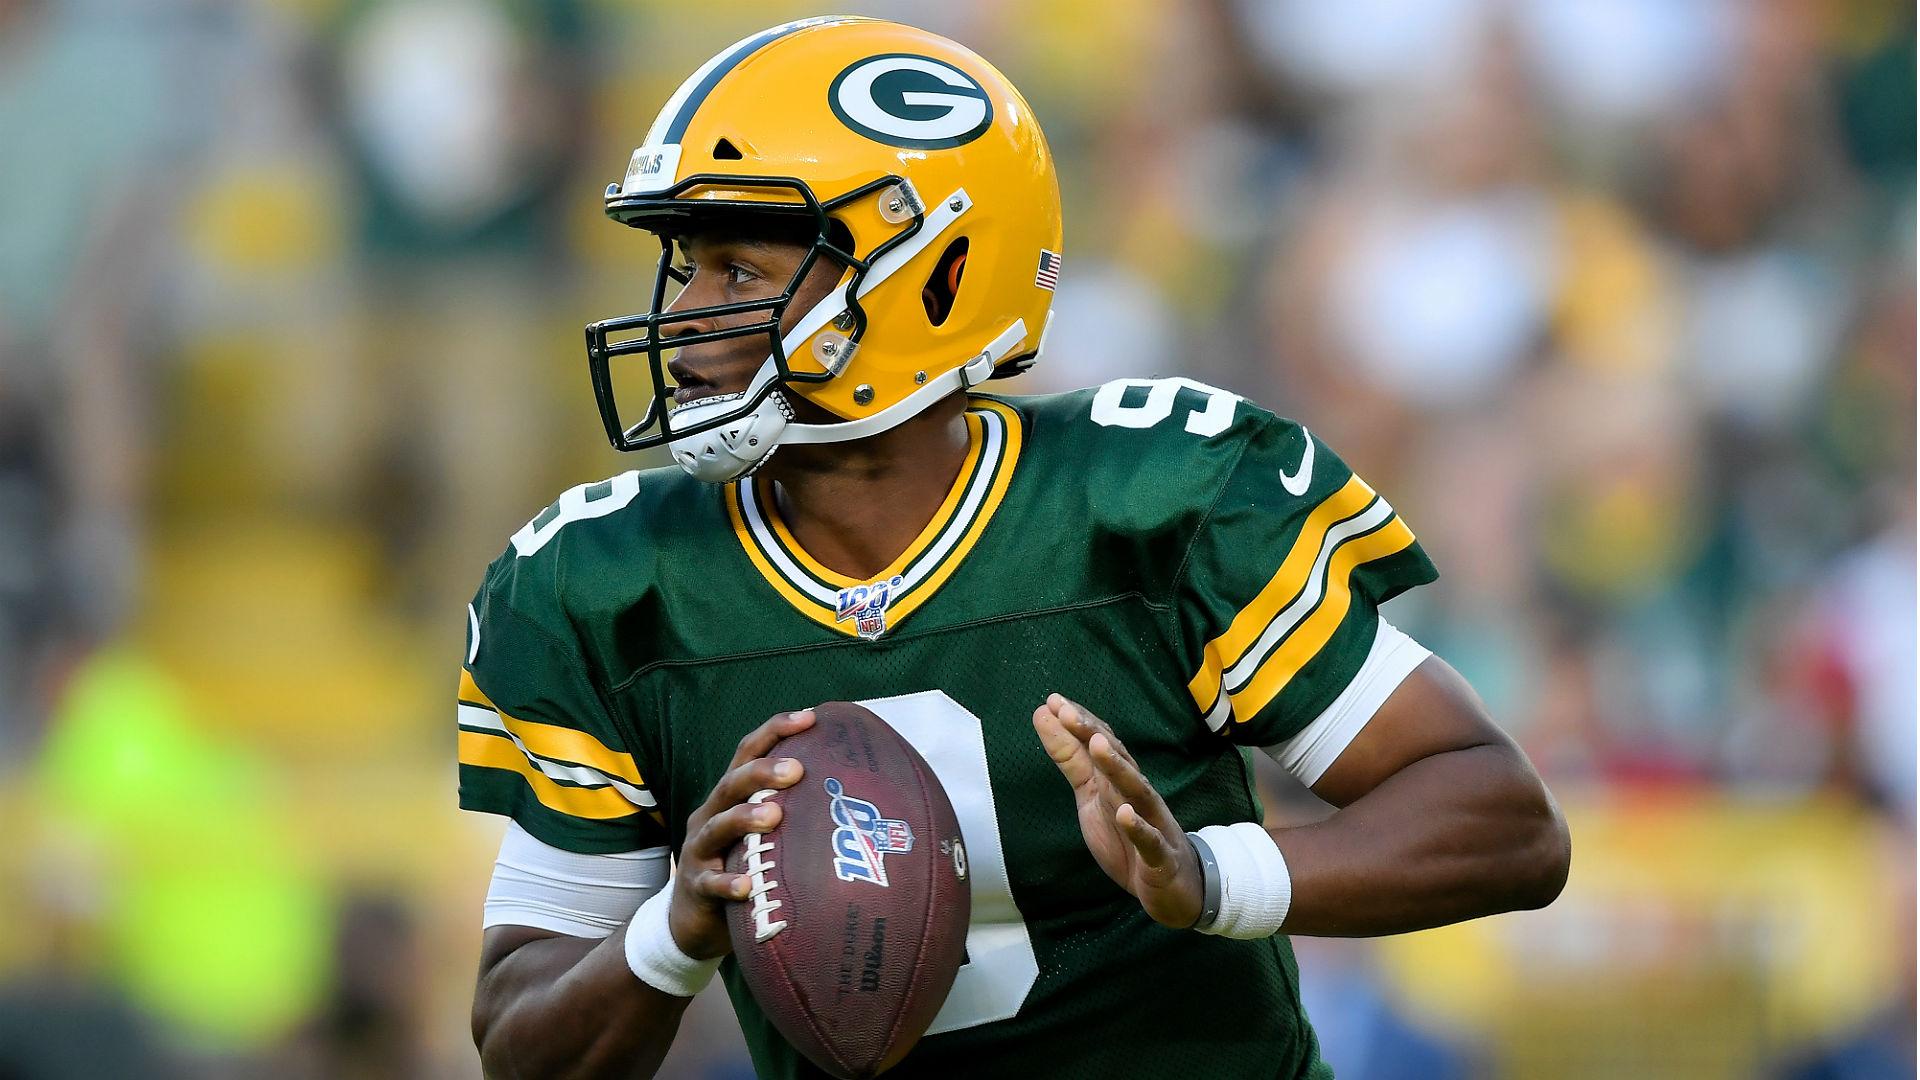 NFL waiver wire: Raiders add another quarterback, claim DeShone Kizer